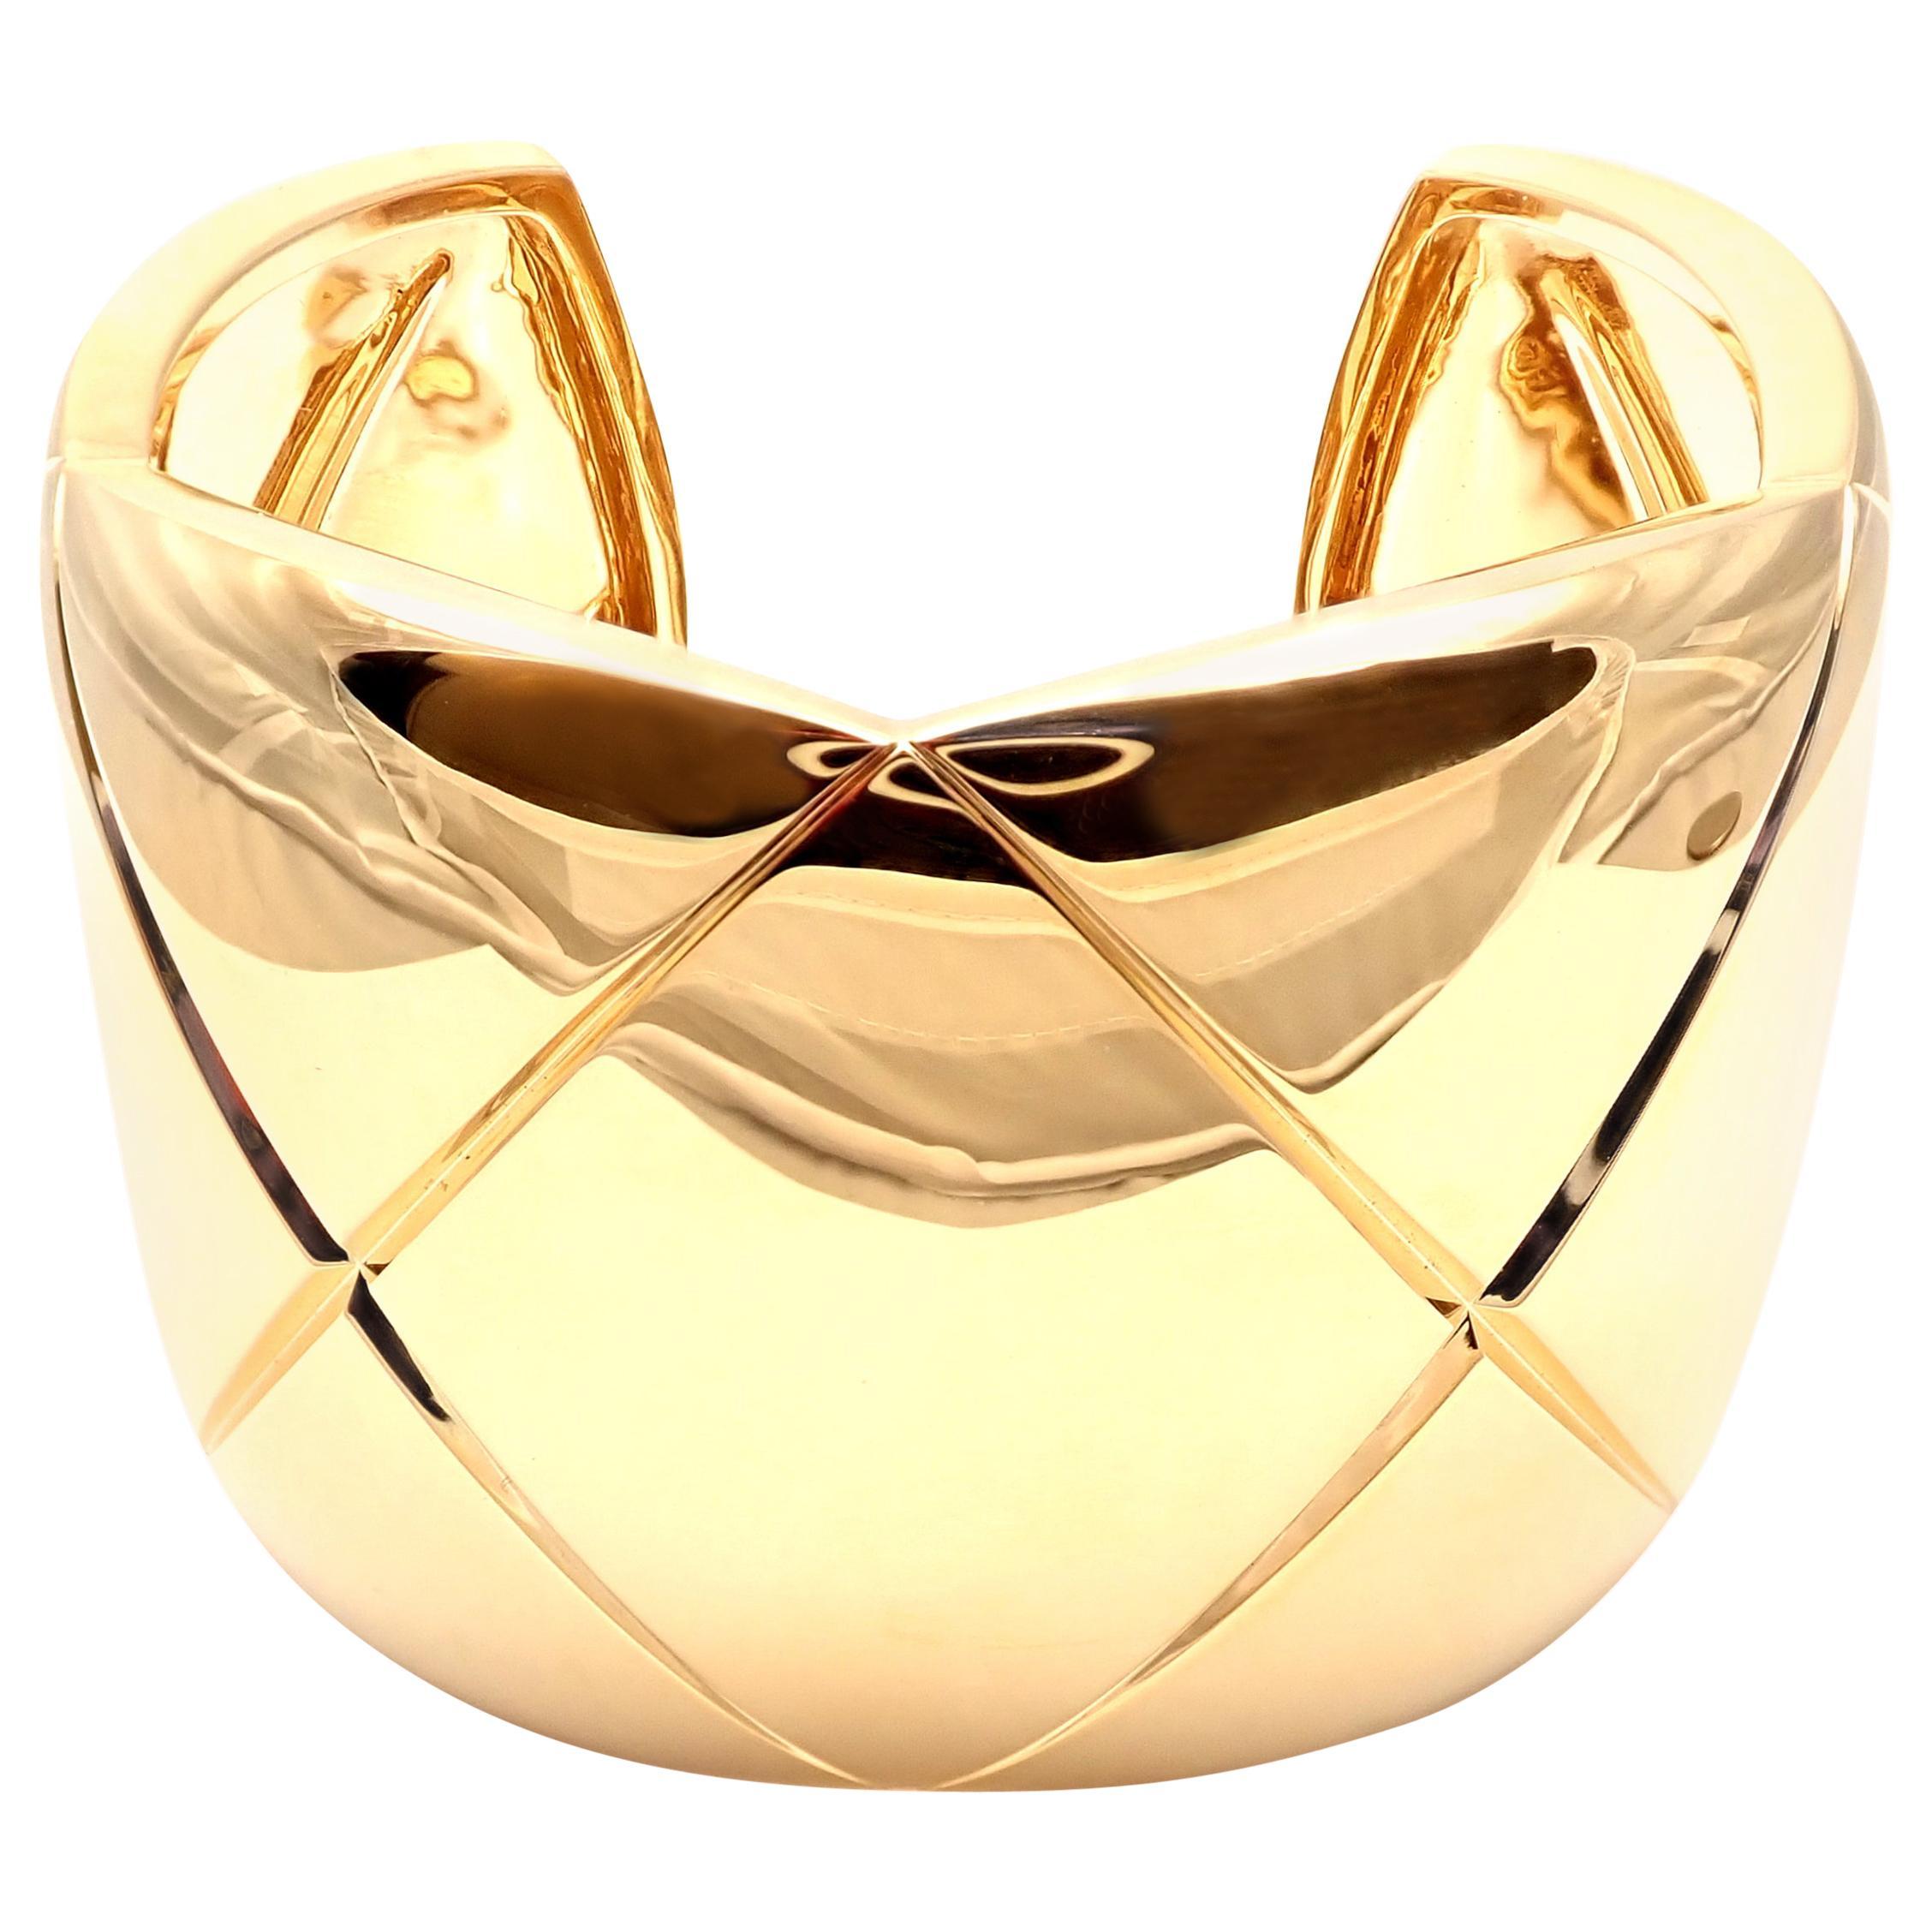 Chanel Coco Crush Yellow Gold Cuff Bangle Bracelet